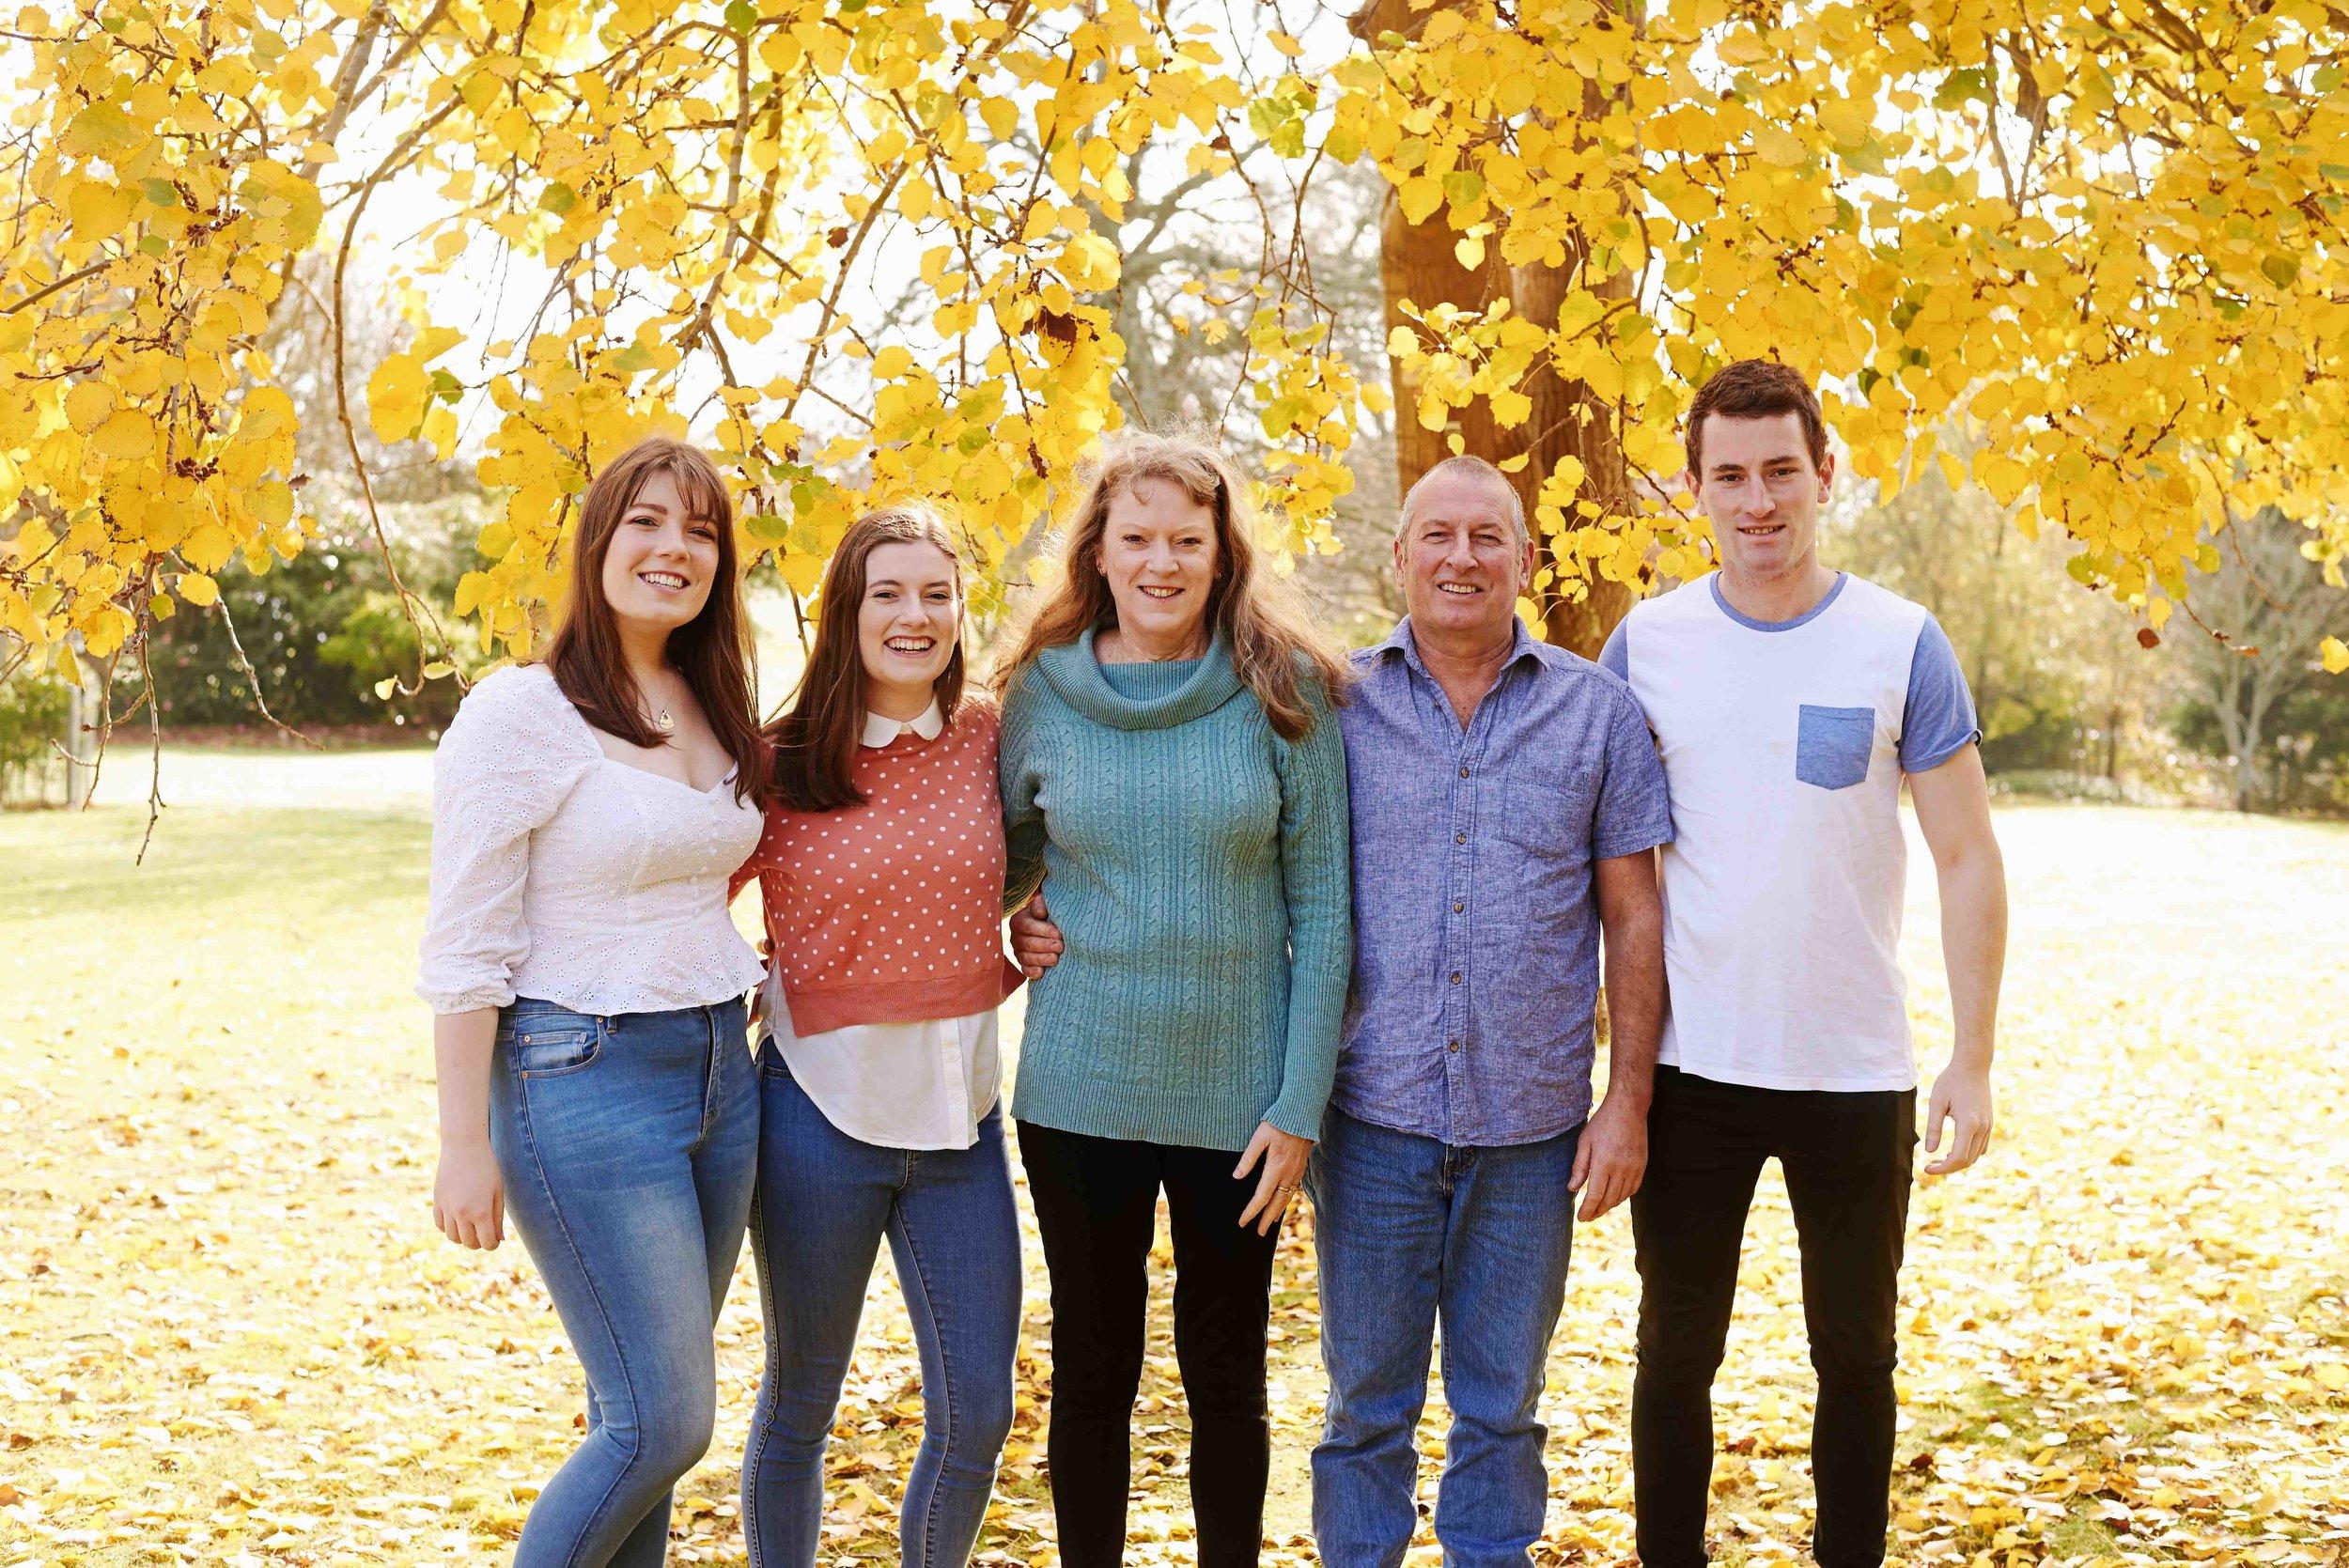 mornington-peninsula-family-photographer-marissa-jade-photography-families-red-hill-2.jpg